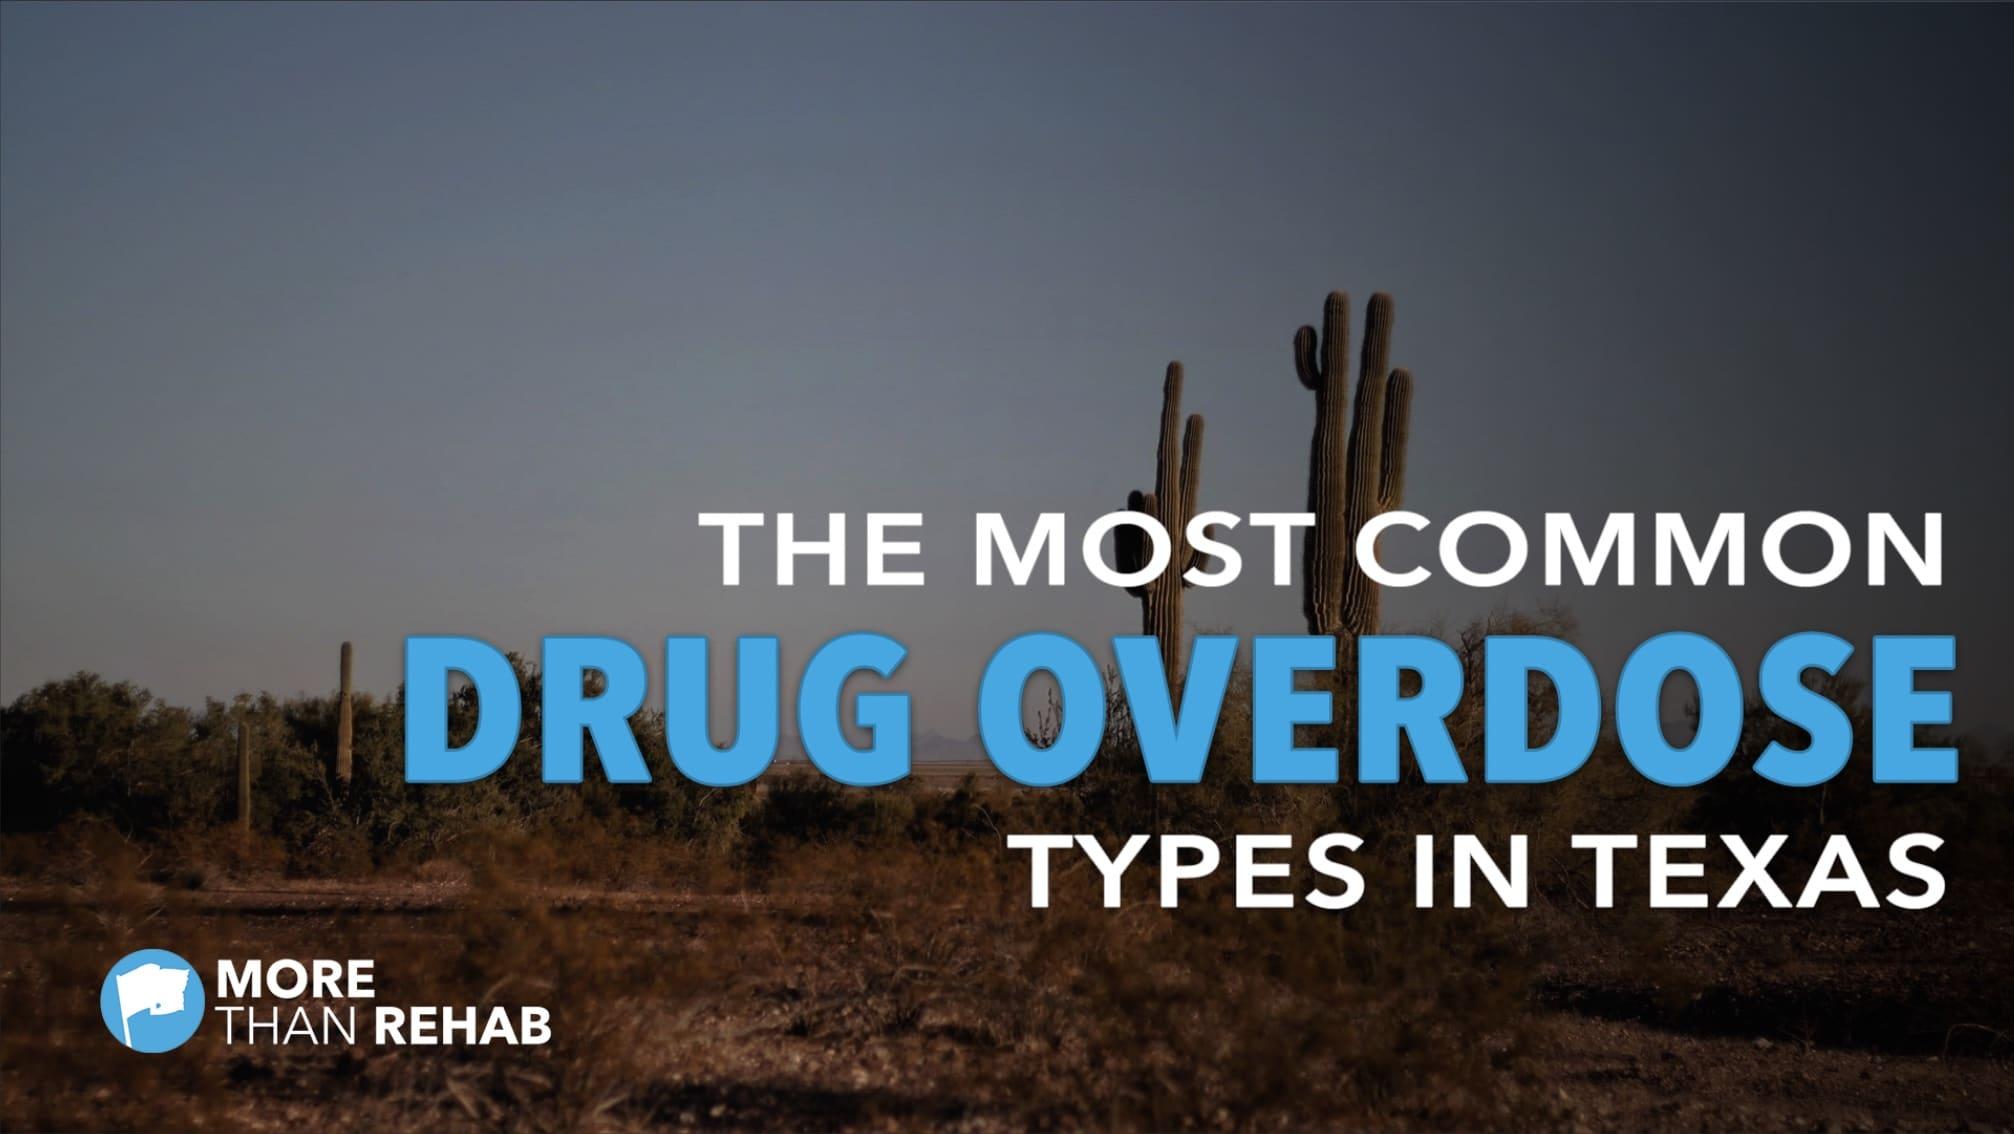 TX-drug-overdose-types-meth-cocaine-rehab